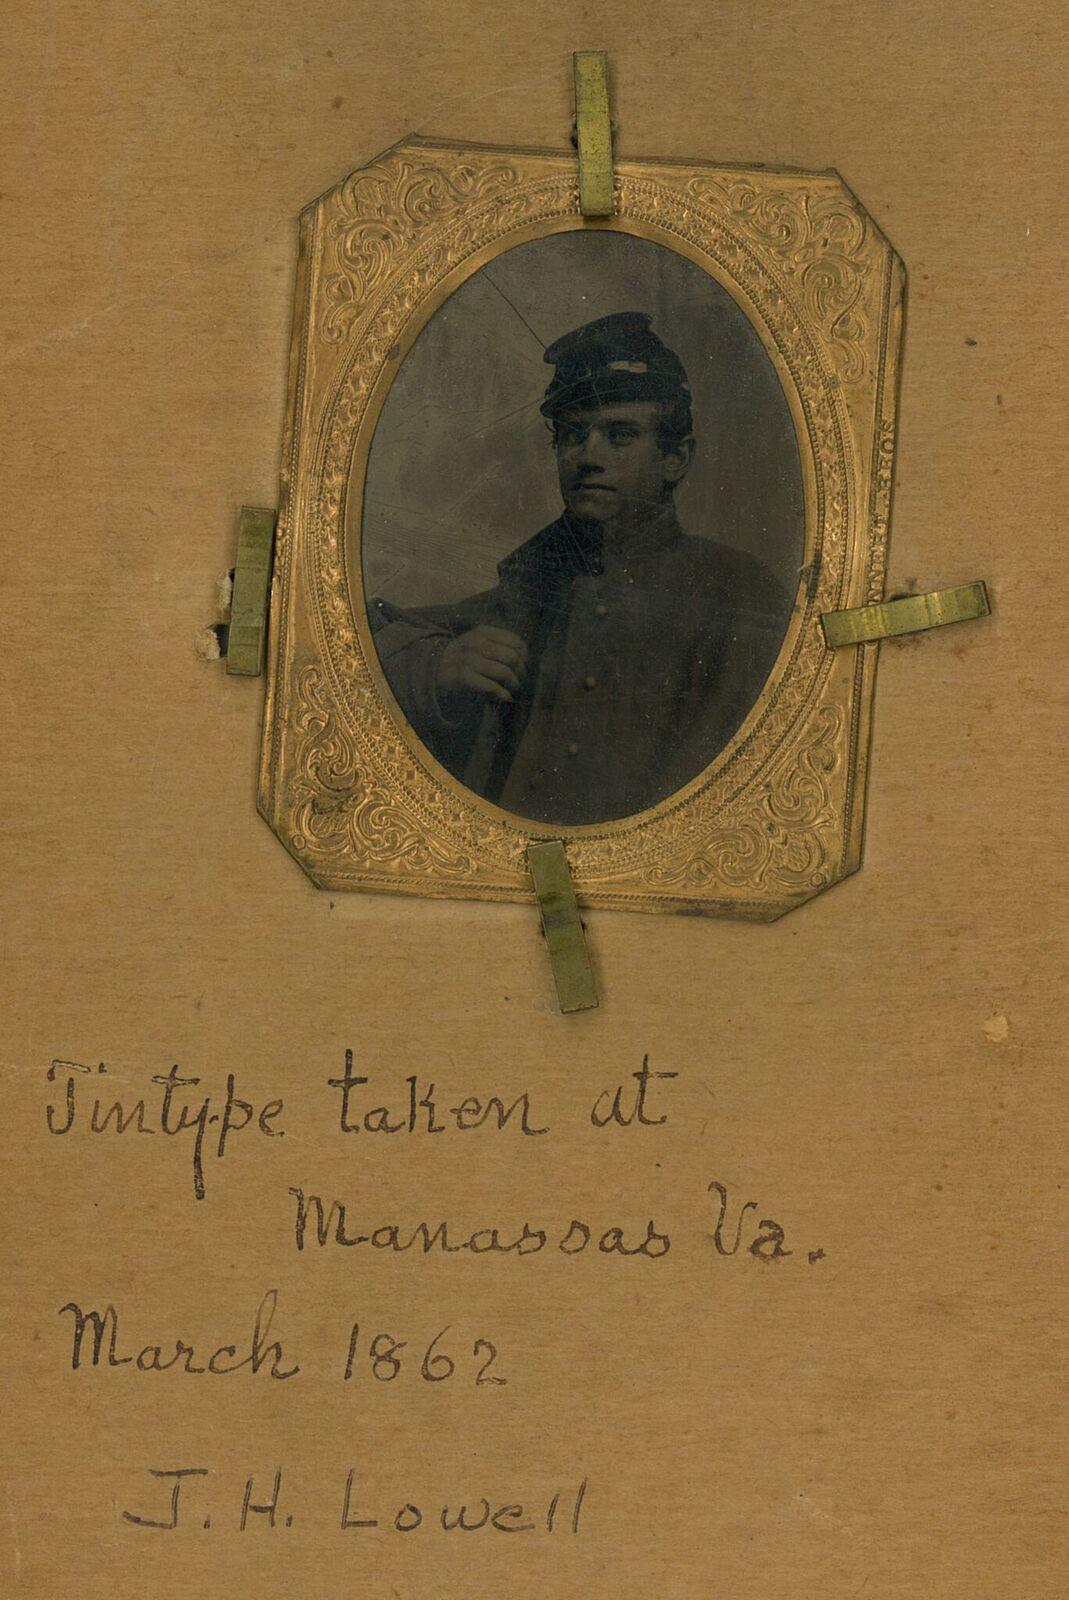 Tintype of James Howard Lowell